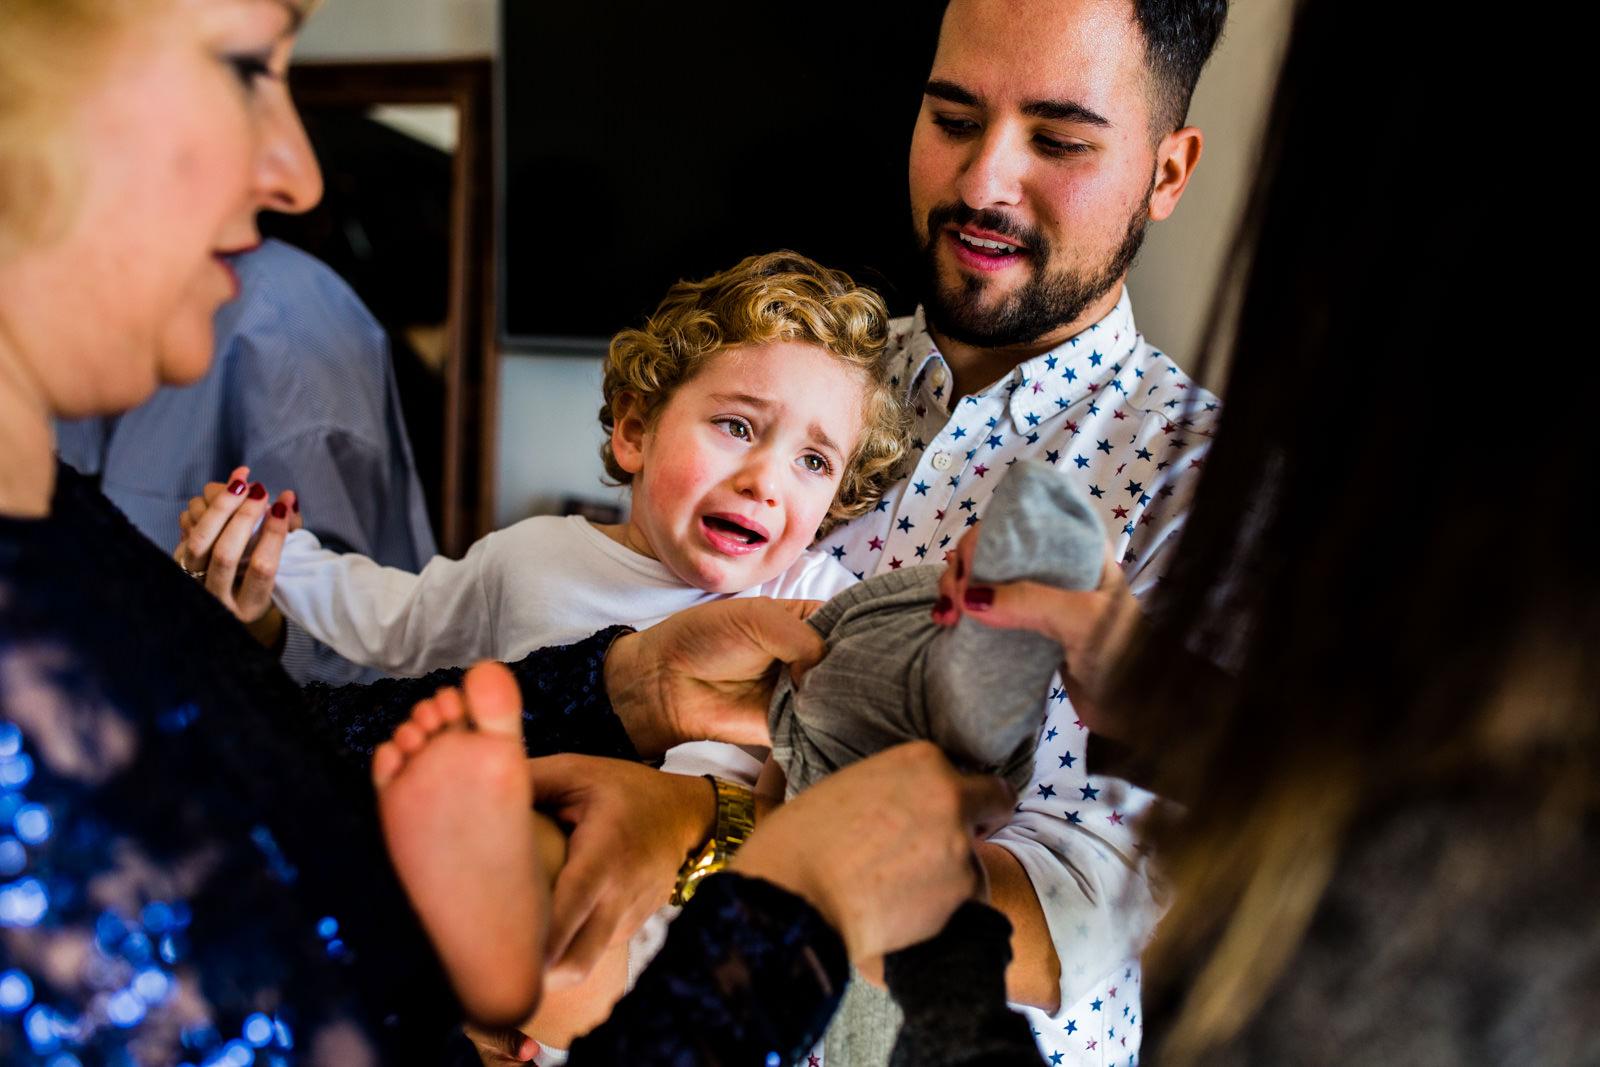 Boda-Sevilla-Parador-Carmona-bridal-engagement-Rafael-Torres-fotografo-bodas-sevilla-madrid-barcelona-wedding-photographer--17.jpg